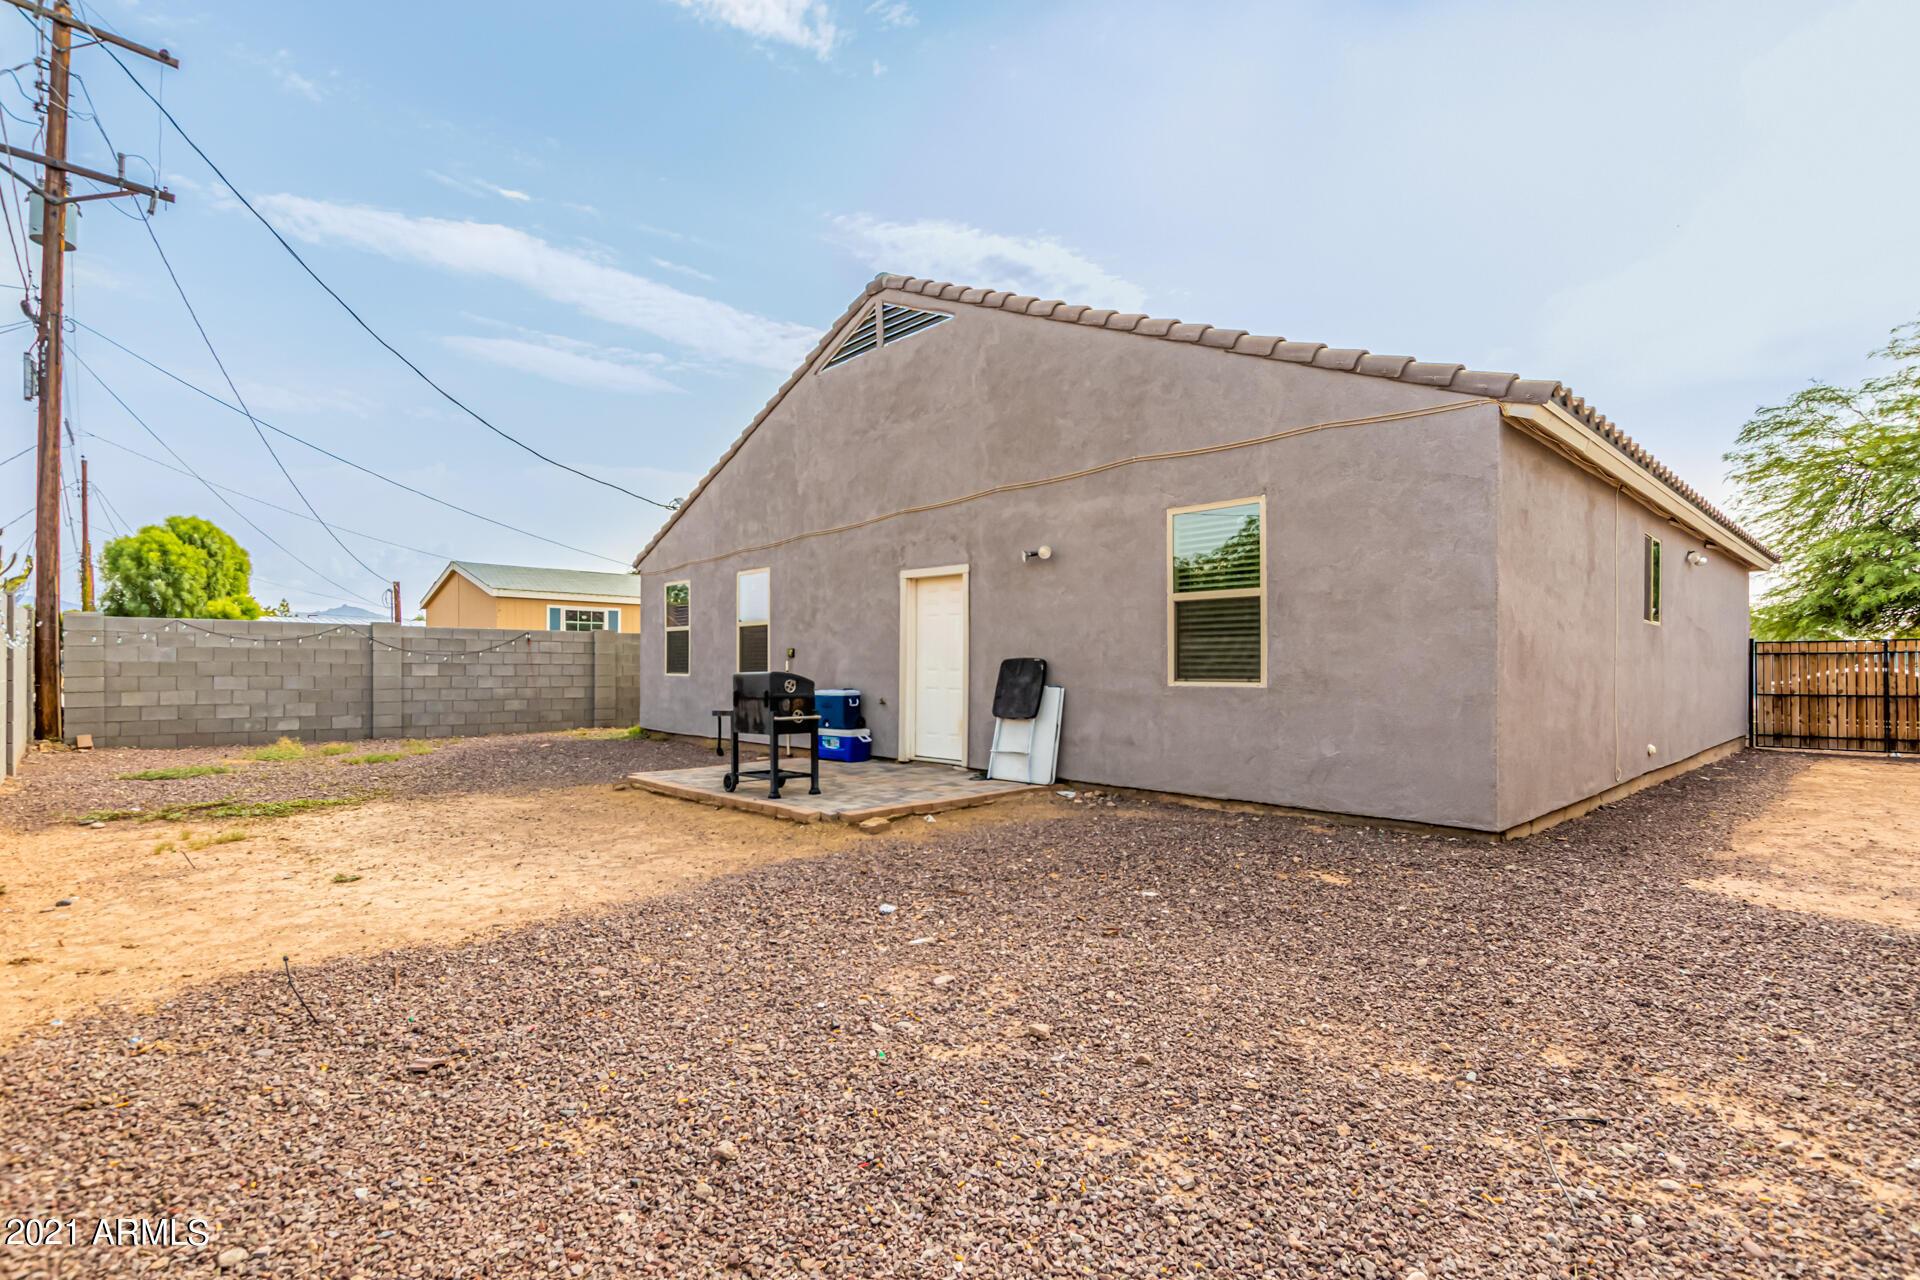 MLS 6272142 1911 S 111TH Drive, Avondale, AZ 85323 Avondale AZ Newly Built